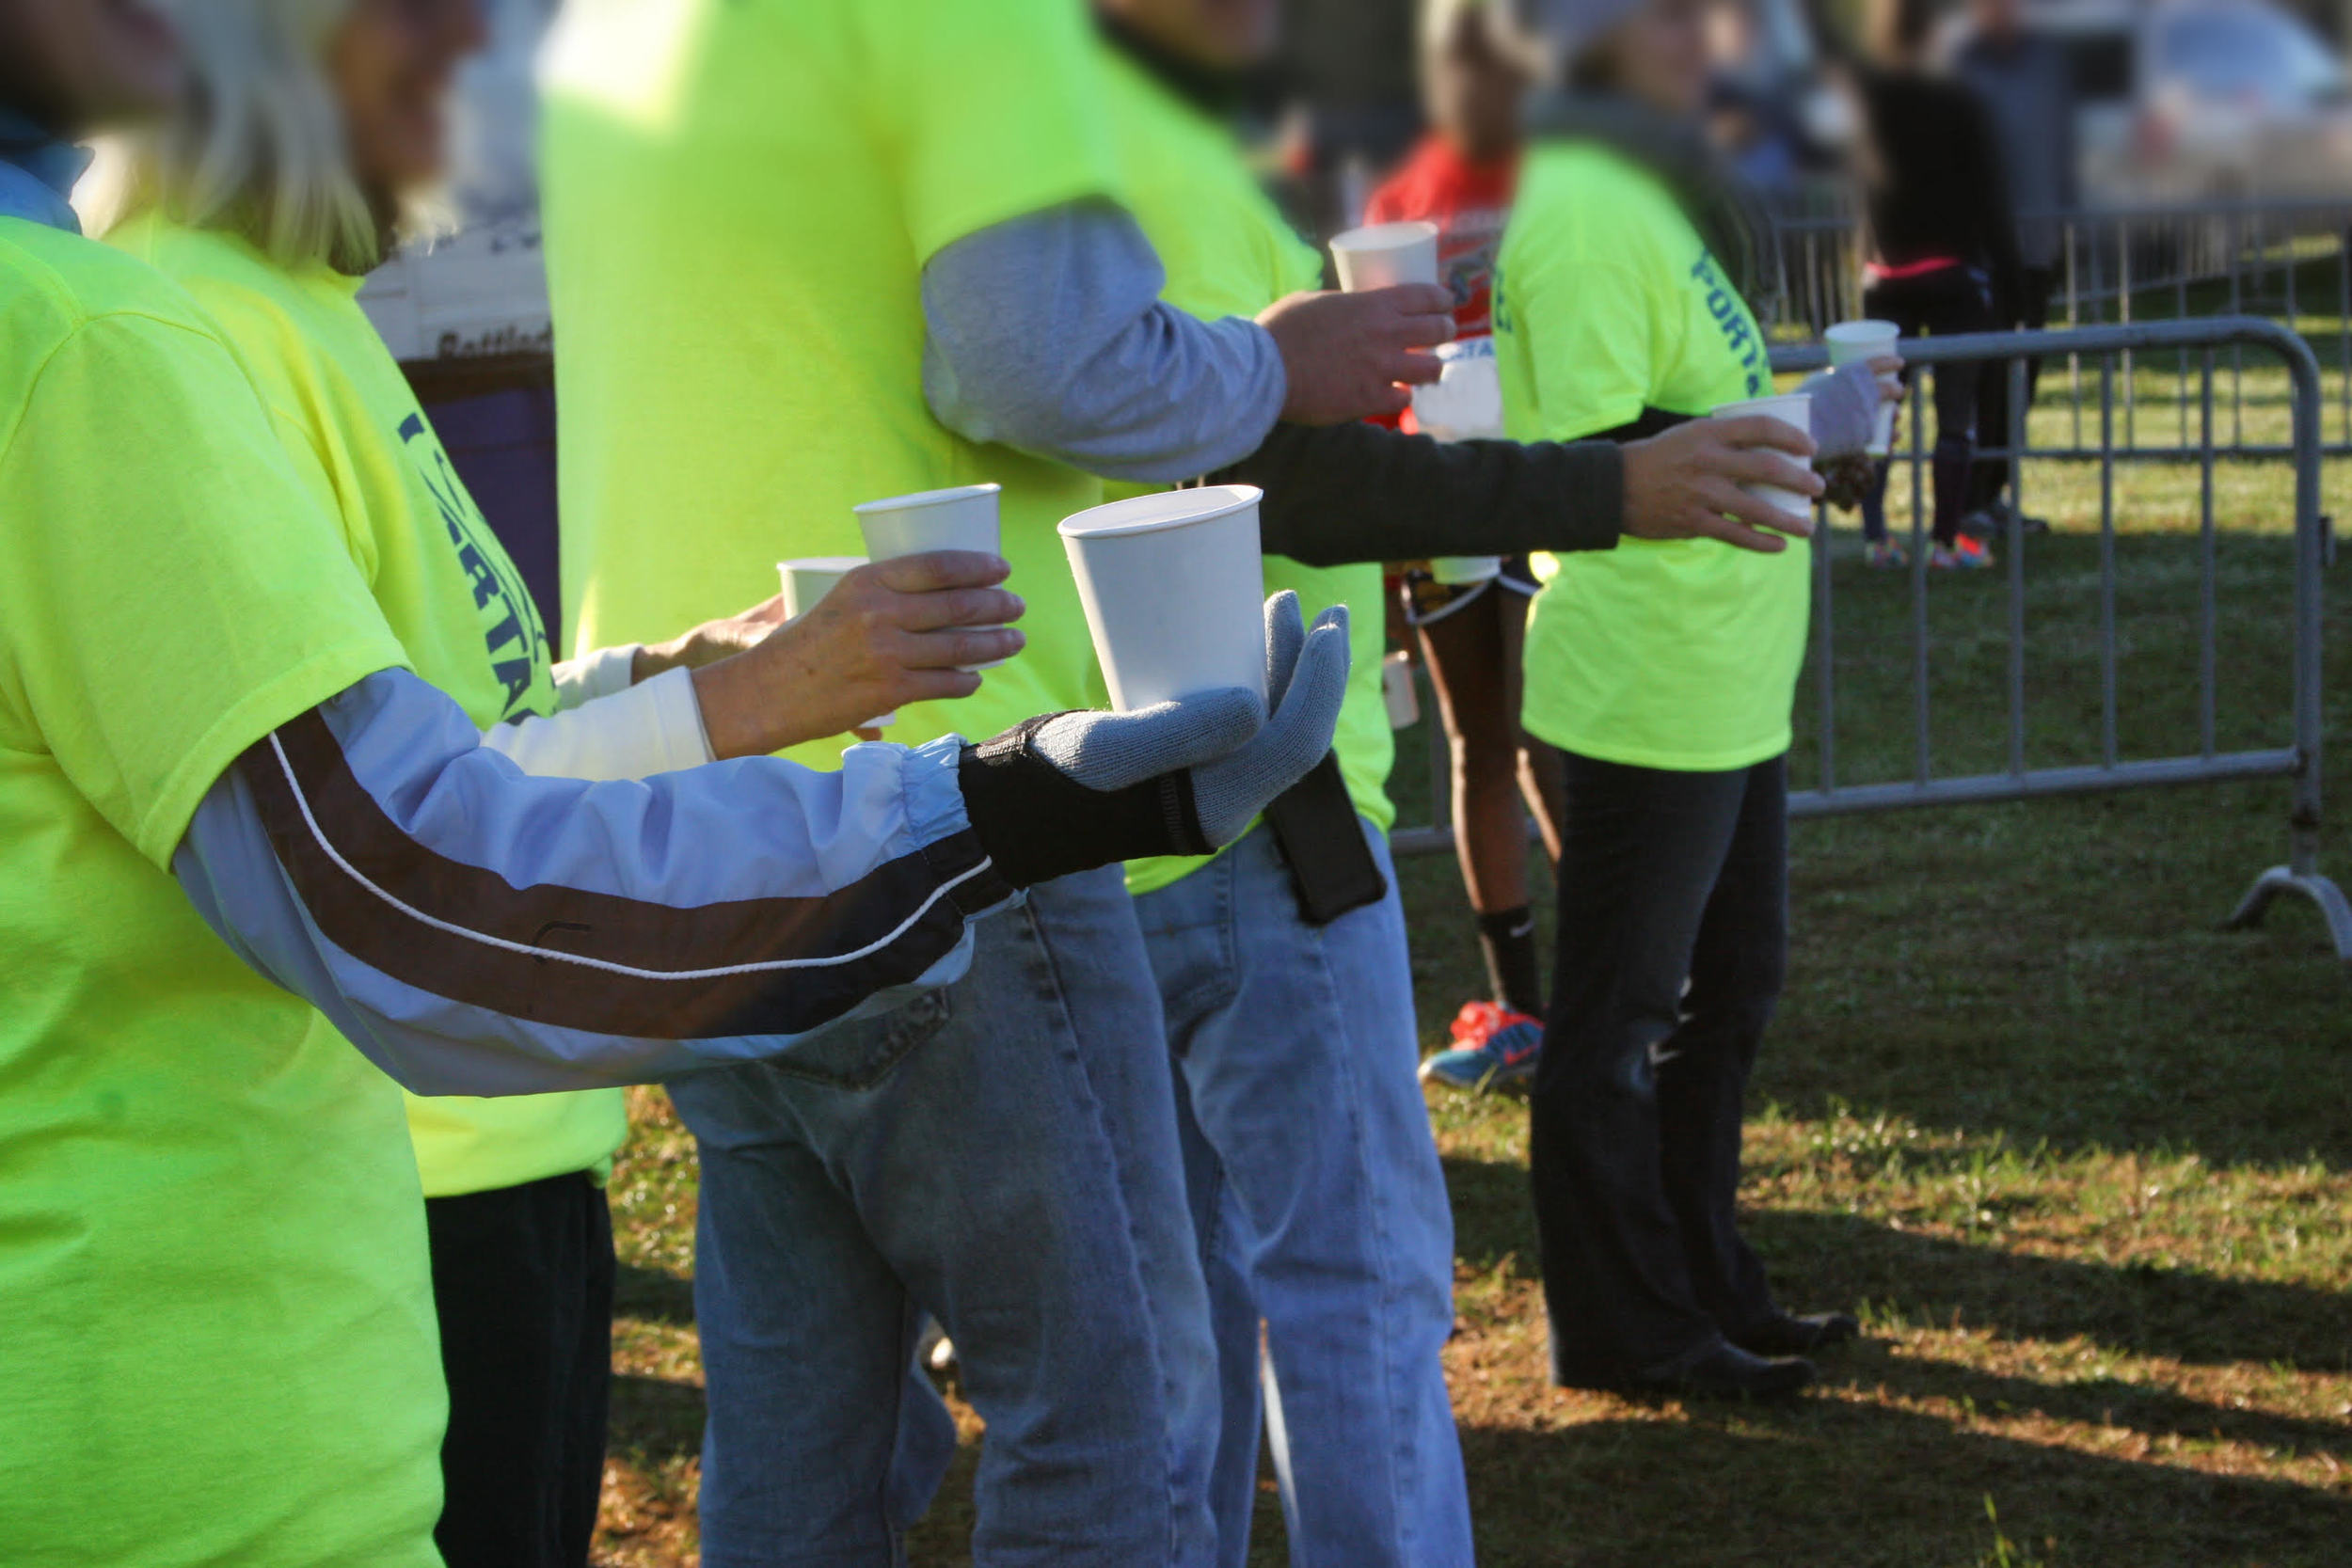 Volunteers handing out cups.